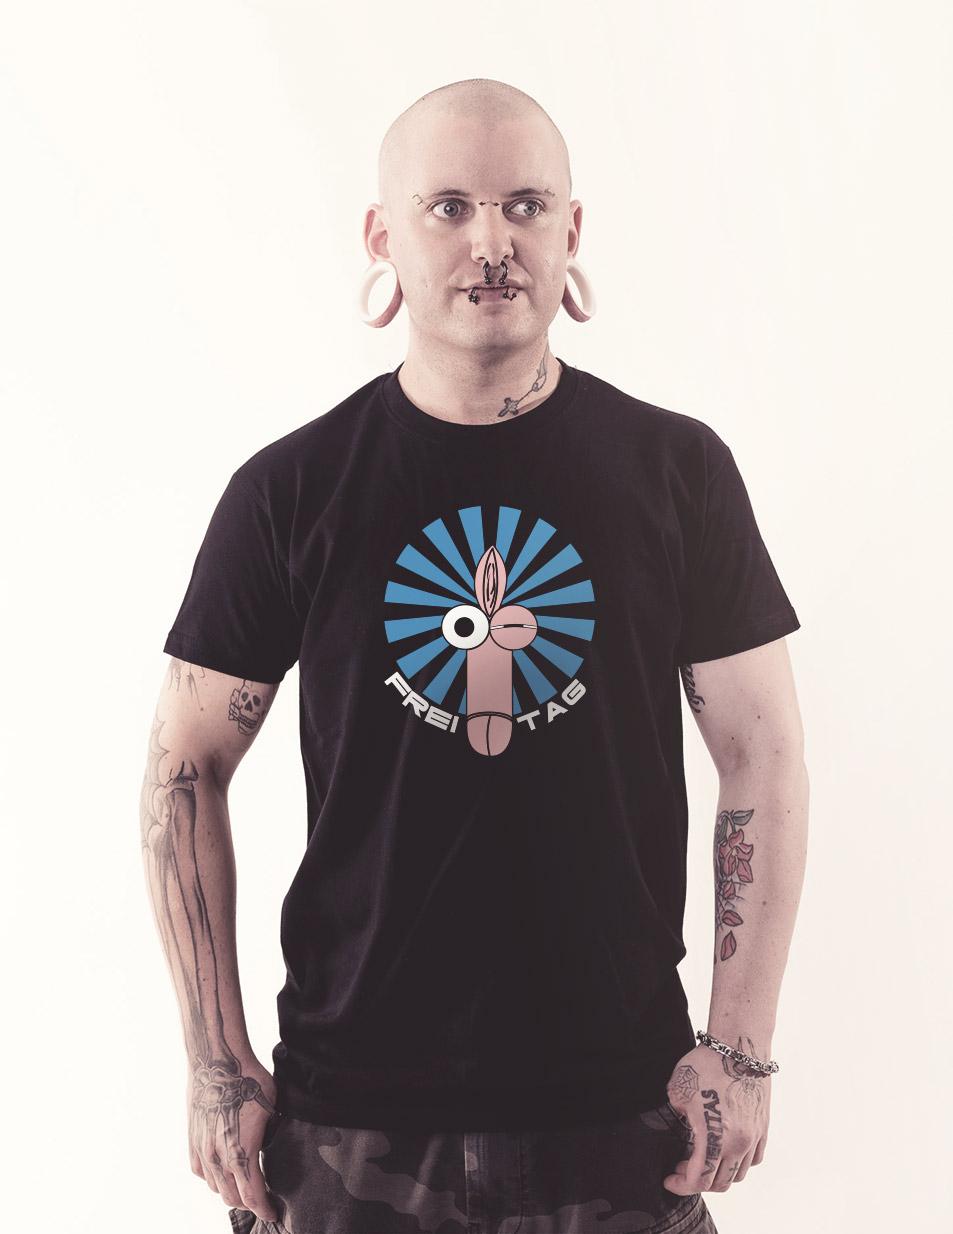 Fotzenpimmelshirt - Freitag mehrfarbig auf schwarz